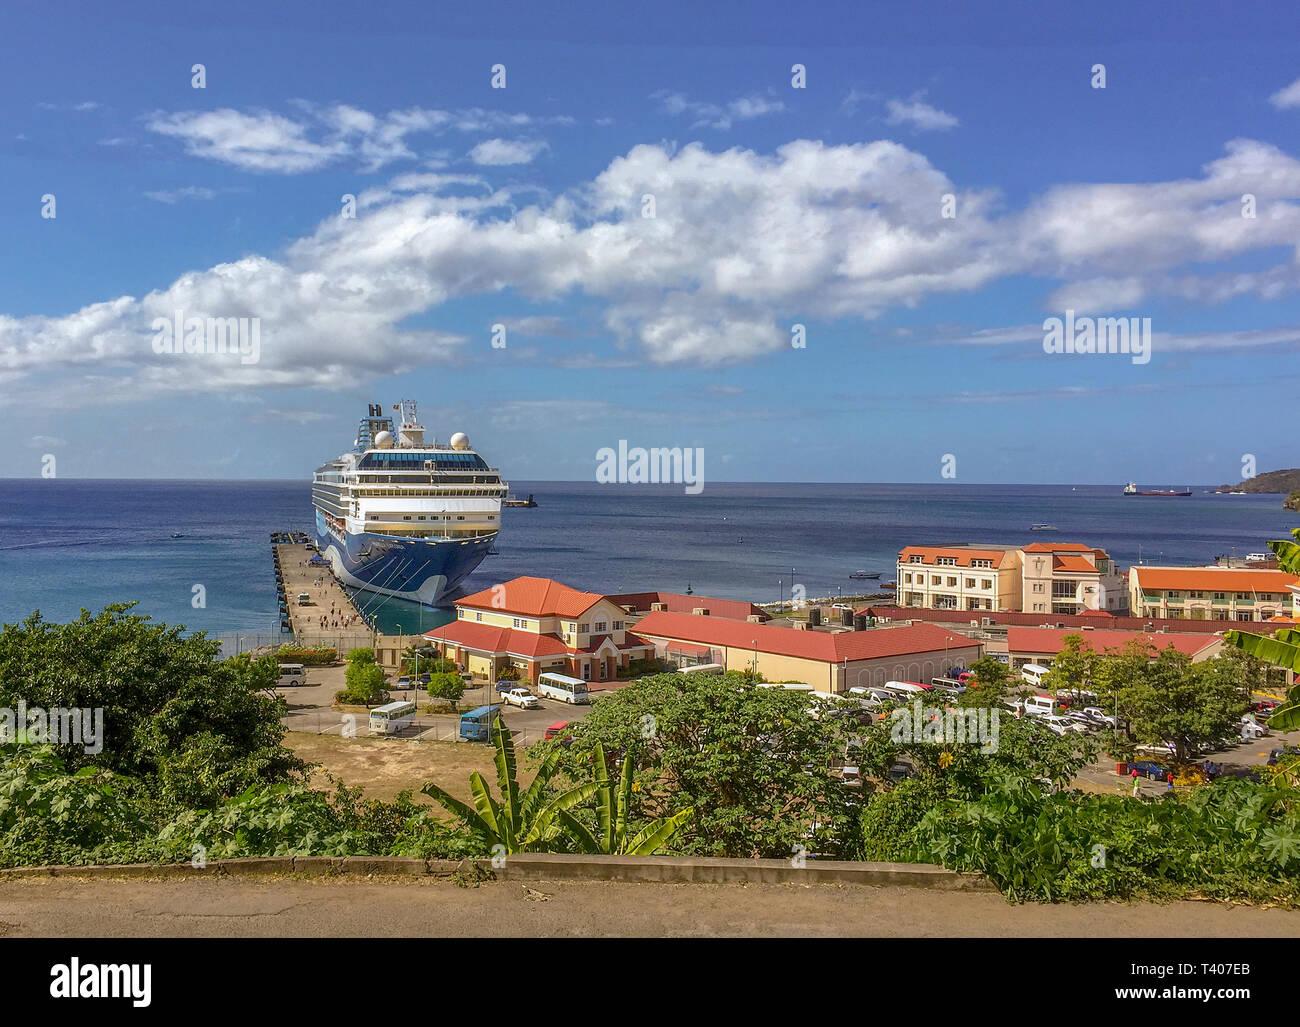 Puerto de Granada. St George's, Granada. Crucero Marella Explorer. Imagen De Stock